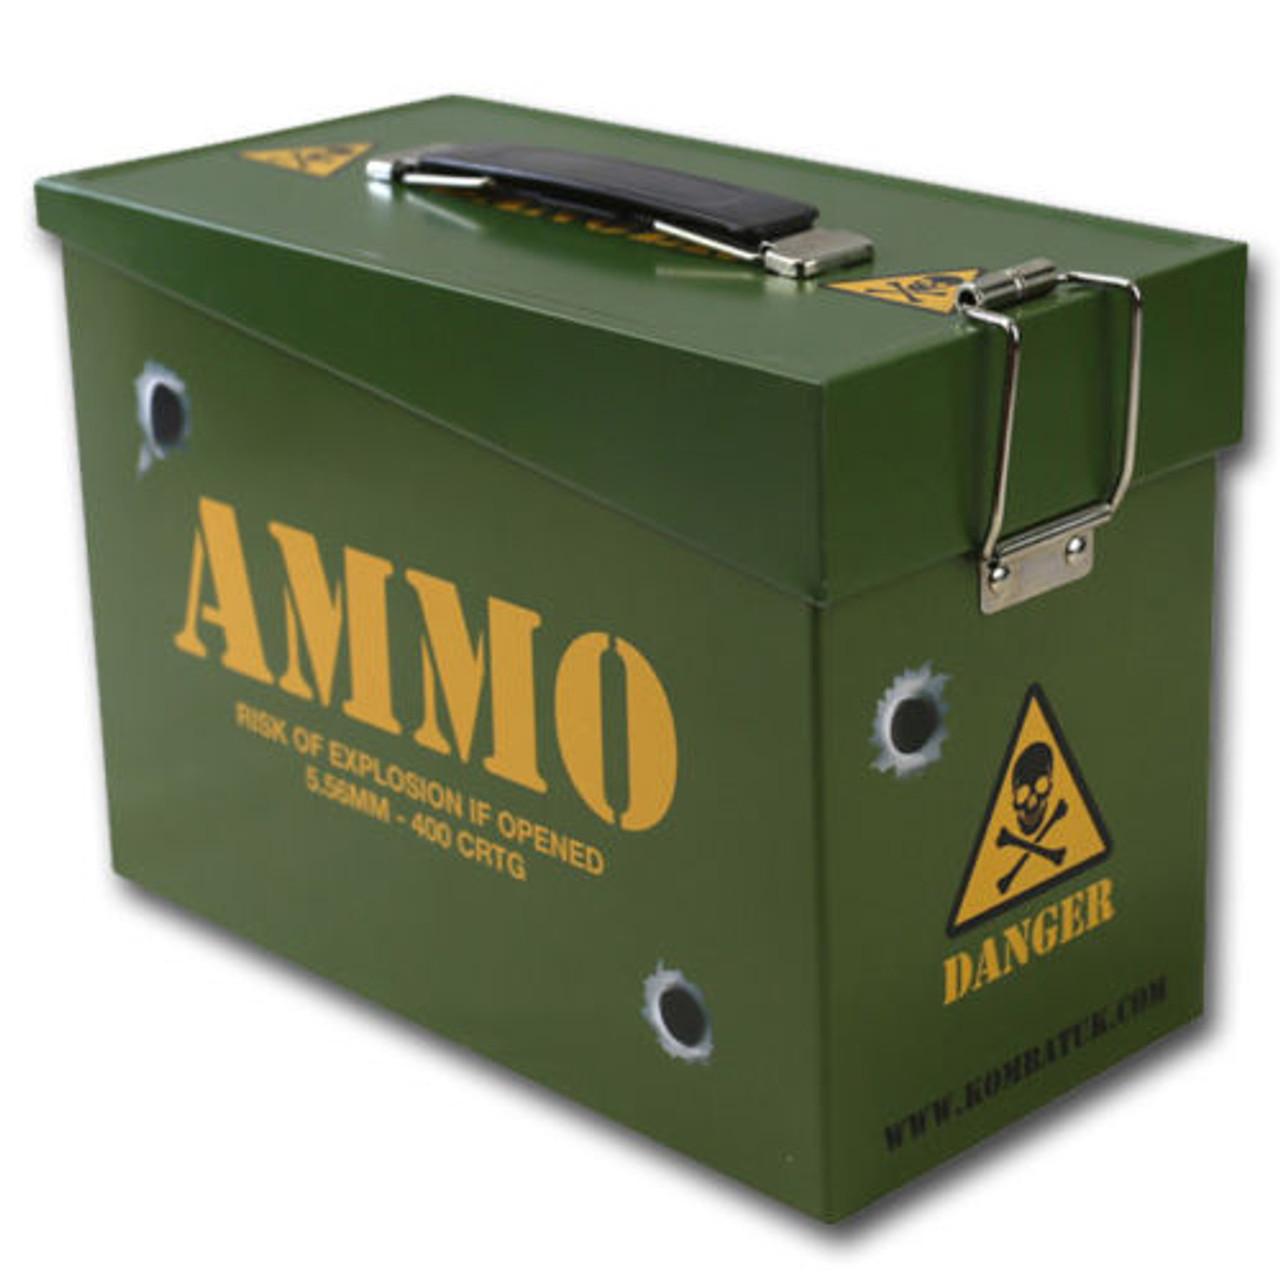 Children's Ammo Box